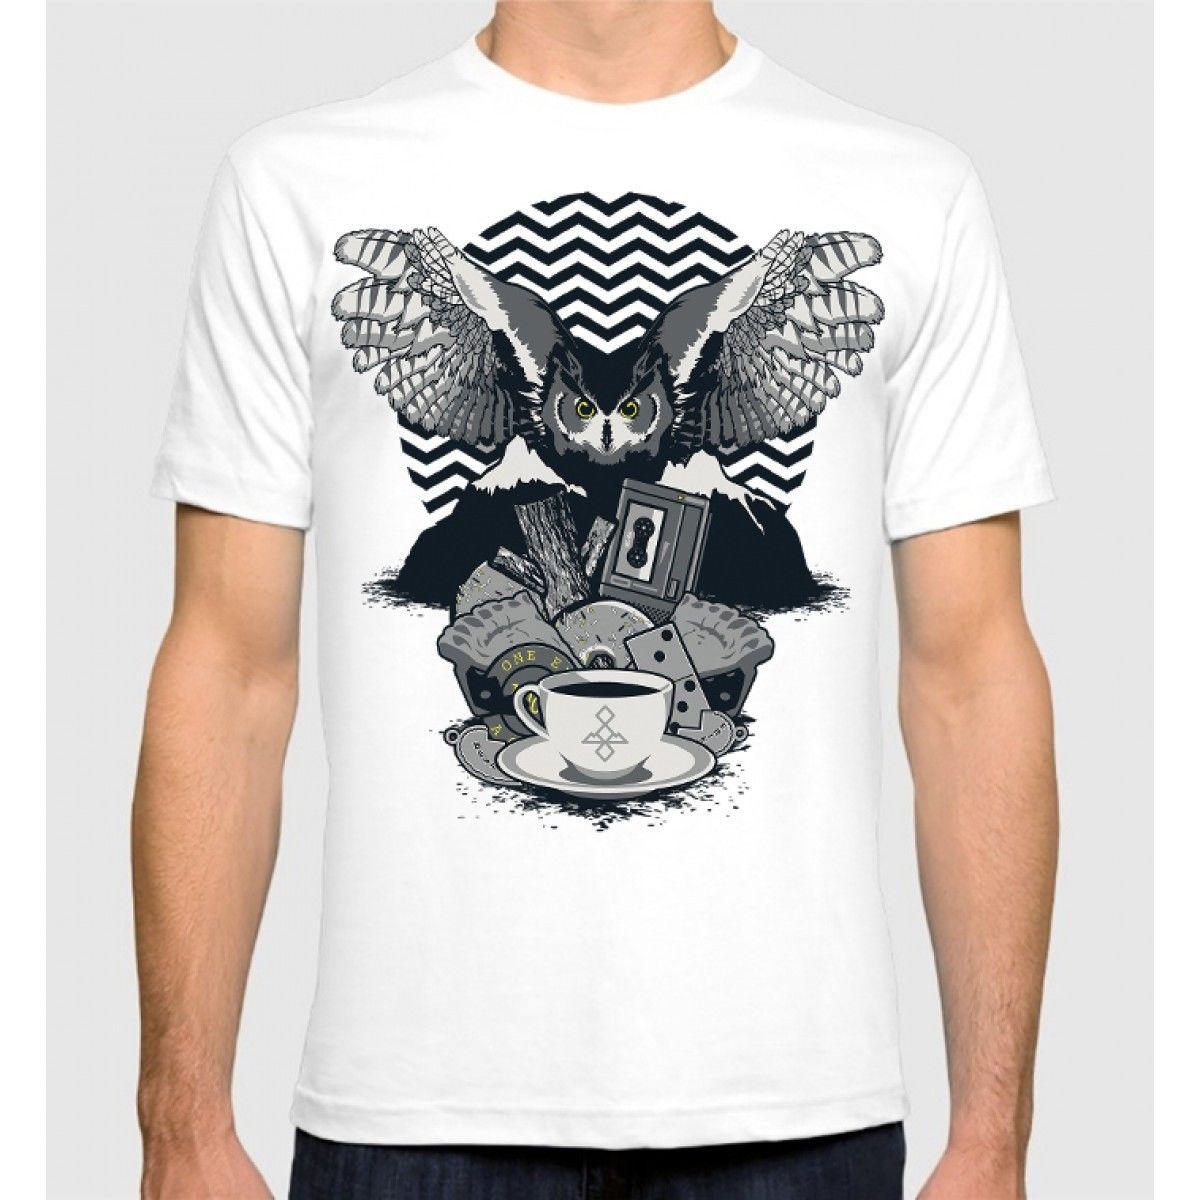 Twin Peaks Art T-Shirt David Lynch 100% Cotton Mens Womens New Cotton Tee Hot New 2018 Summer Fashion T Shirts